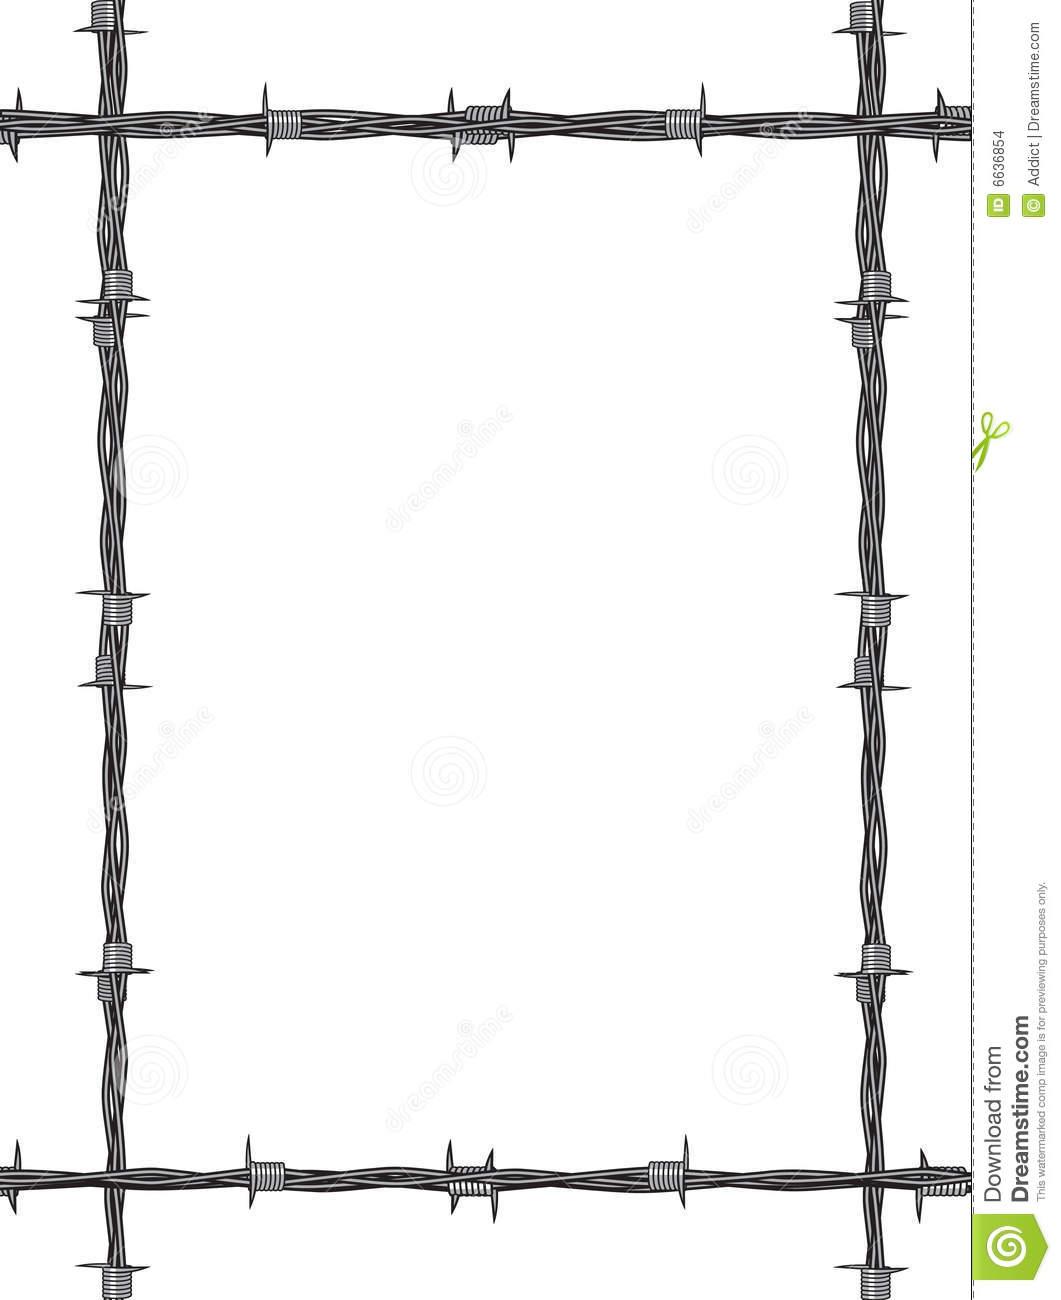 Barbed Wire clipart border Com Roslonek Clip Barbed Clker